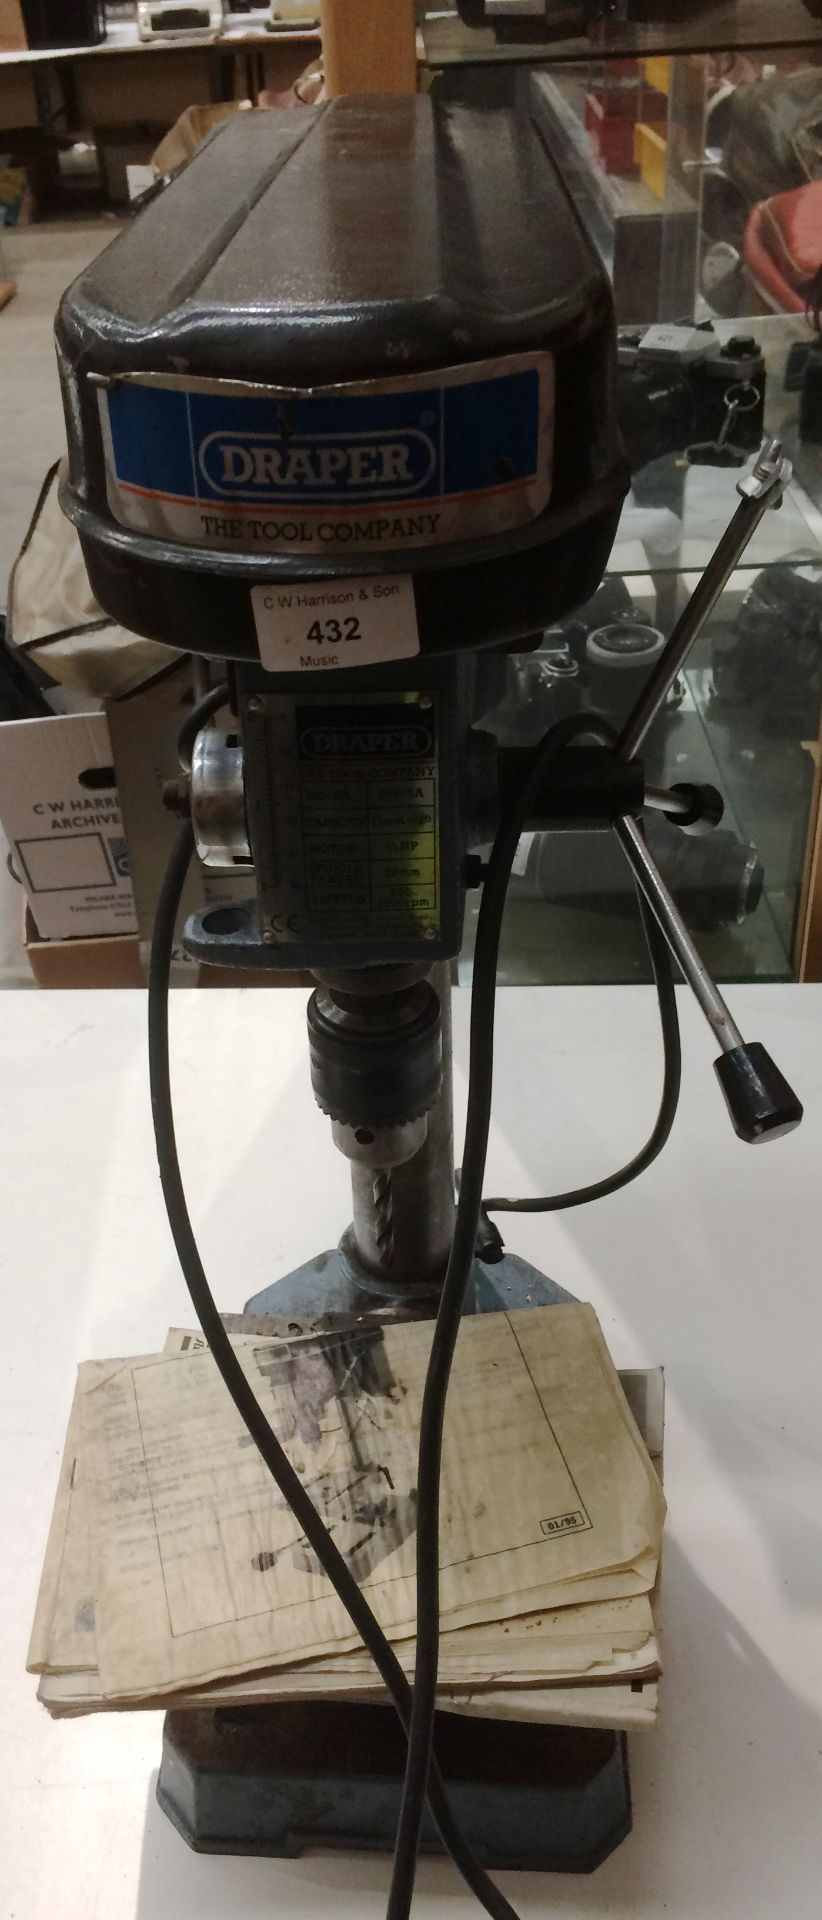 Lot 432 - A Draper model D13/5A bench mounting pillar drill - 240v